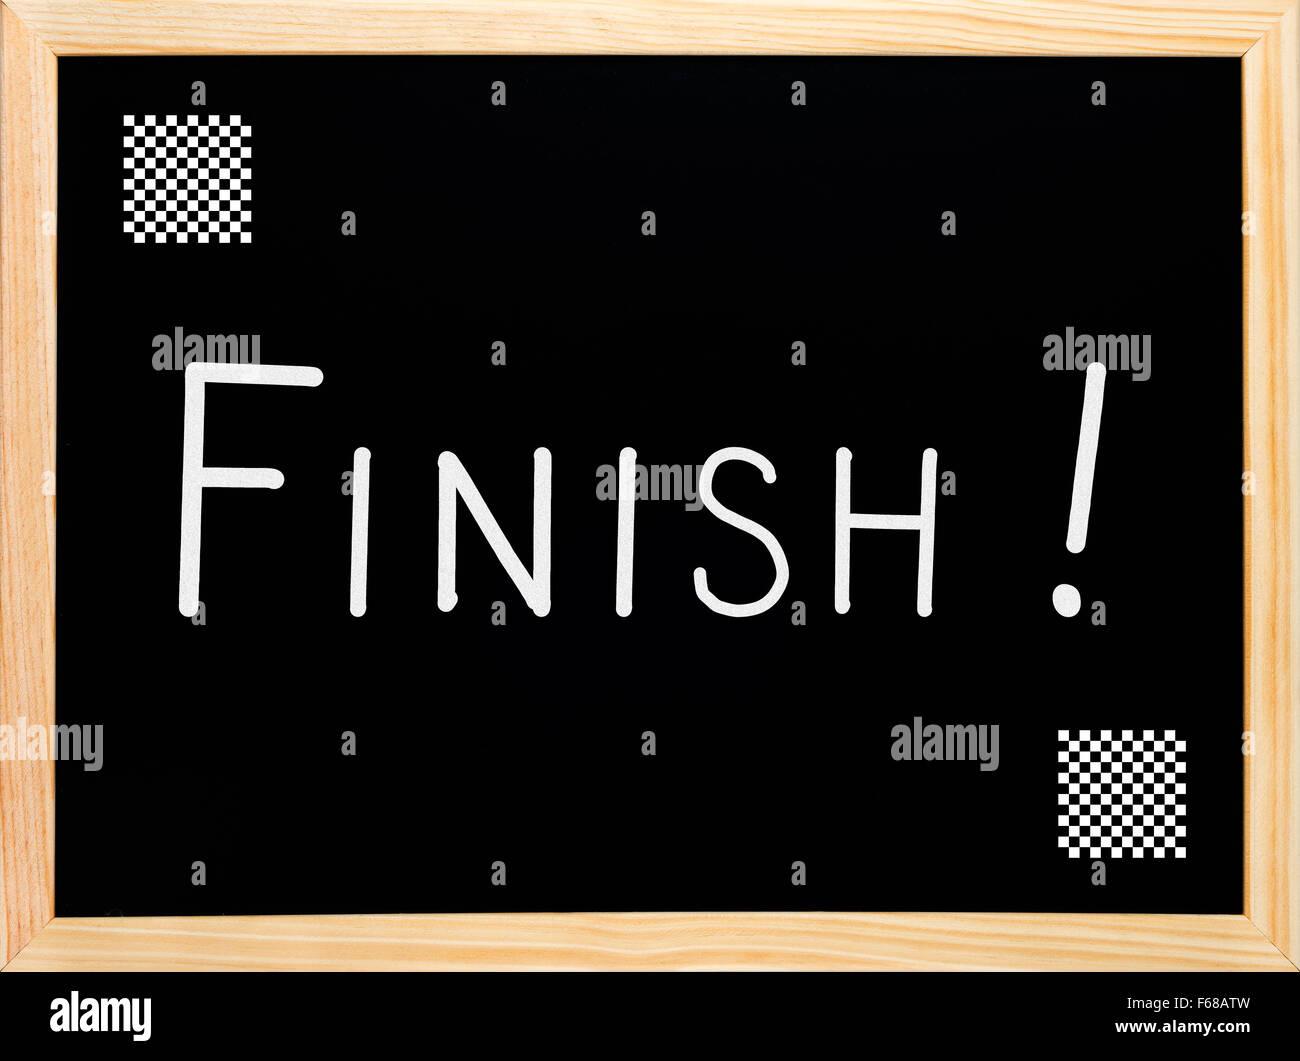 Finish and chess flag written on blackboard or chalkboard - Stock Image